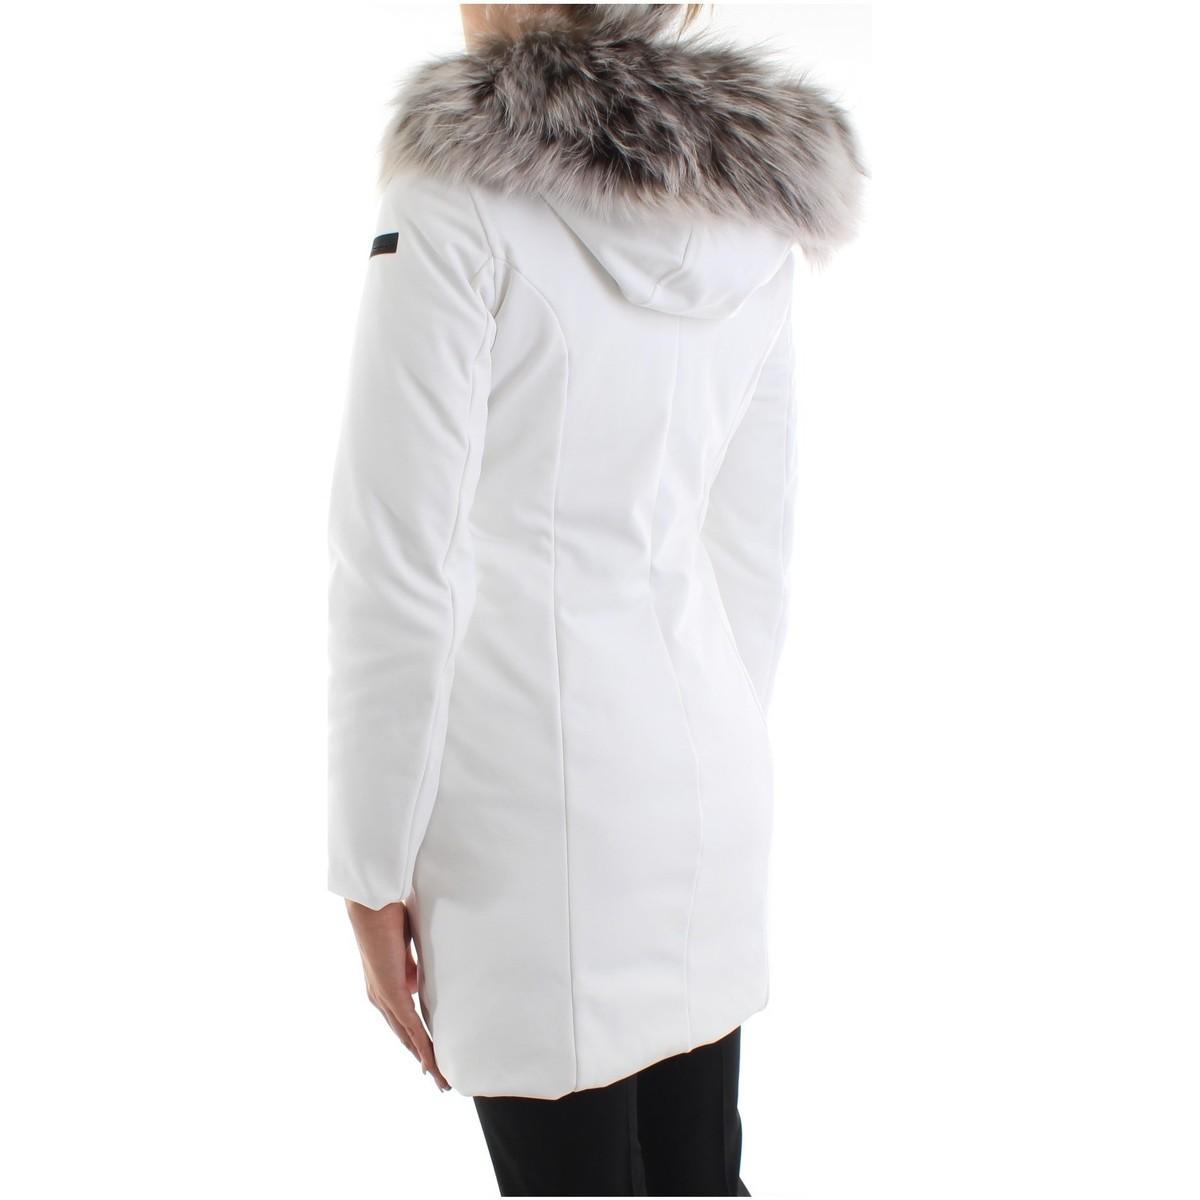 W19501FT Manteau Rrd en coloris Blanc aX8mv